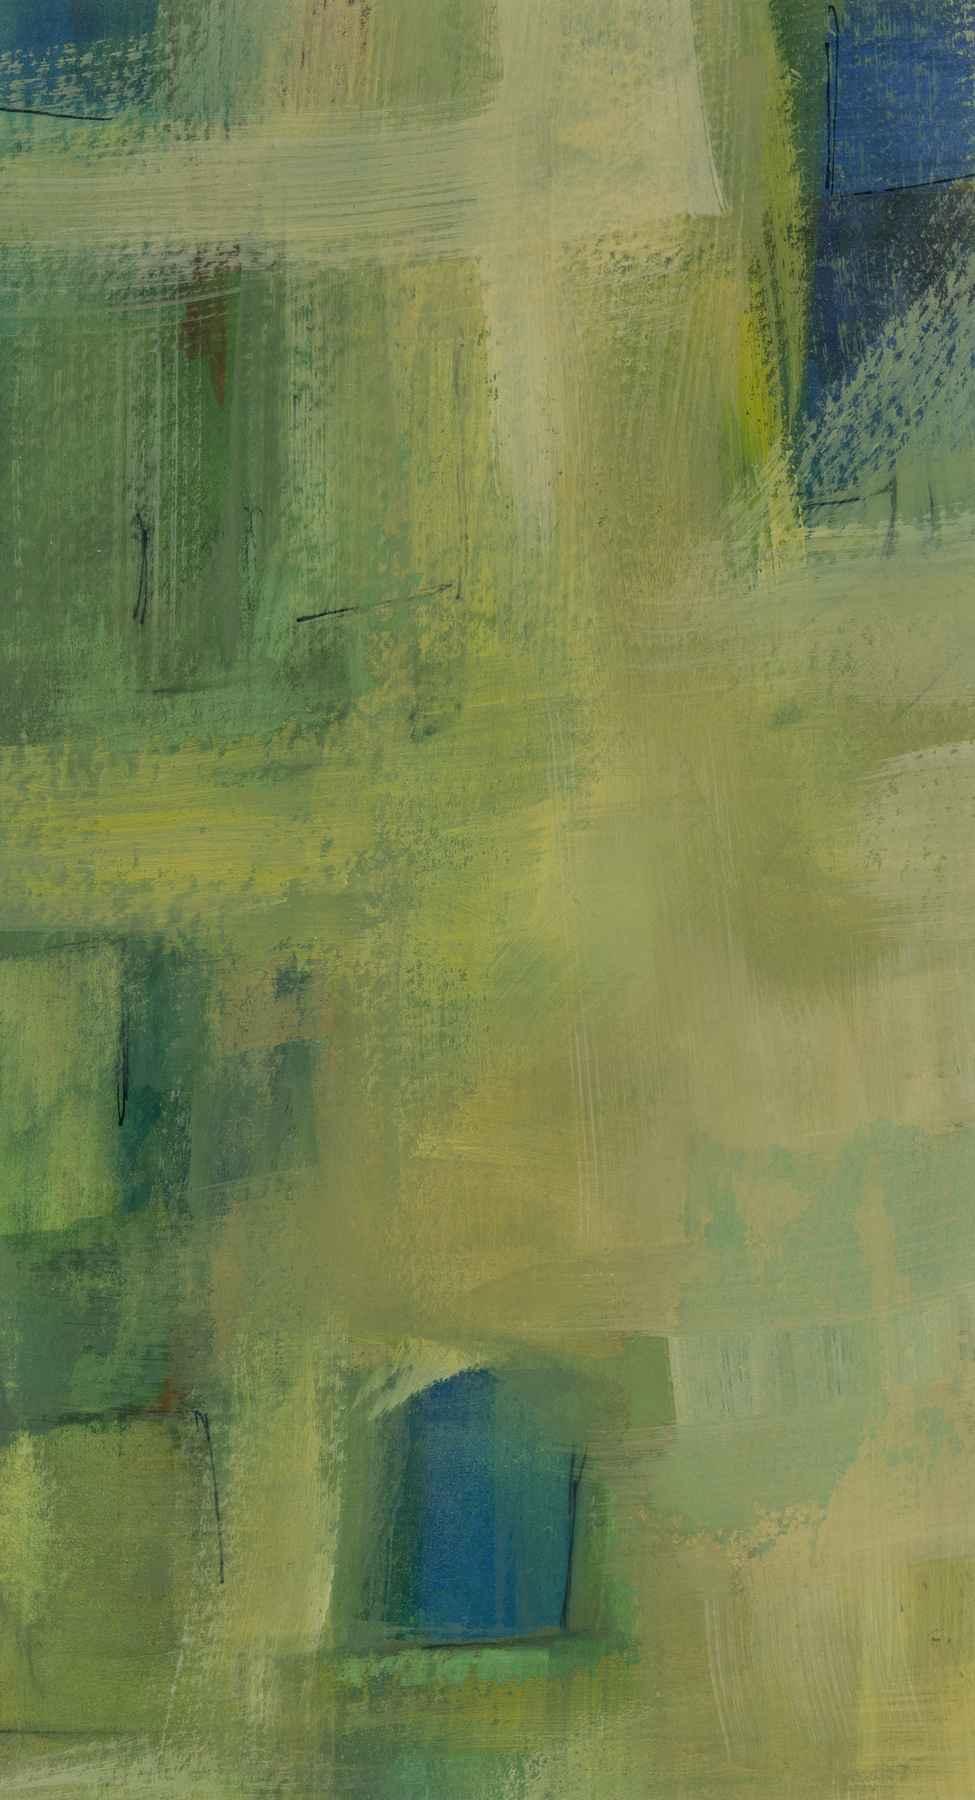 Windows & Doors by  Paula Weech - Masterpiece Online